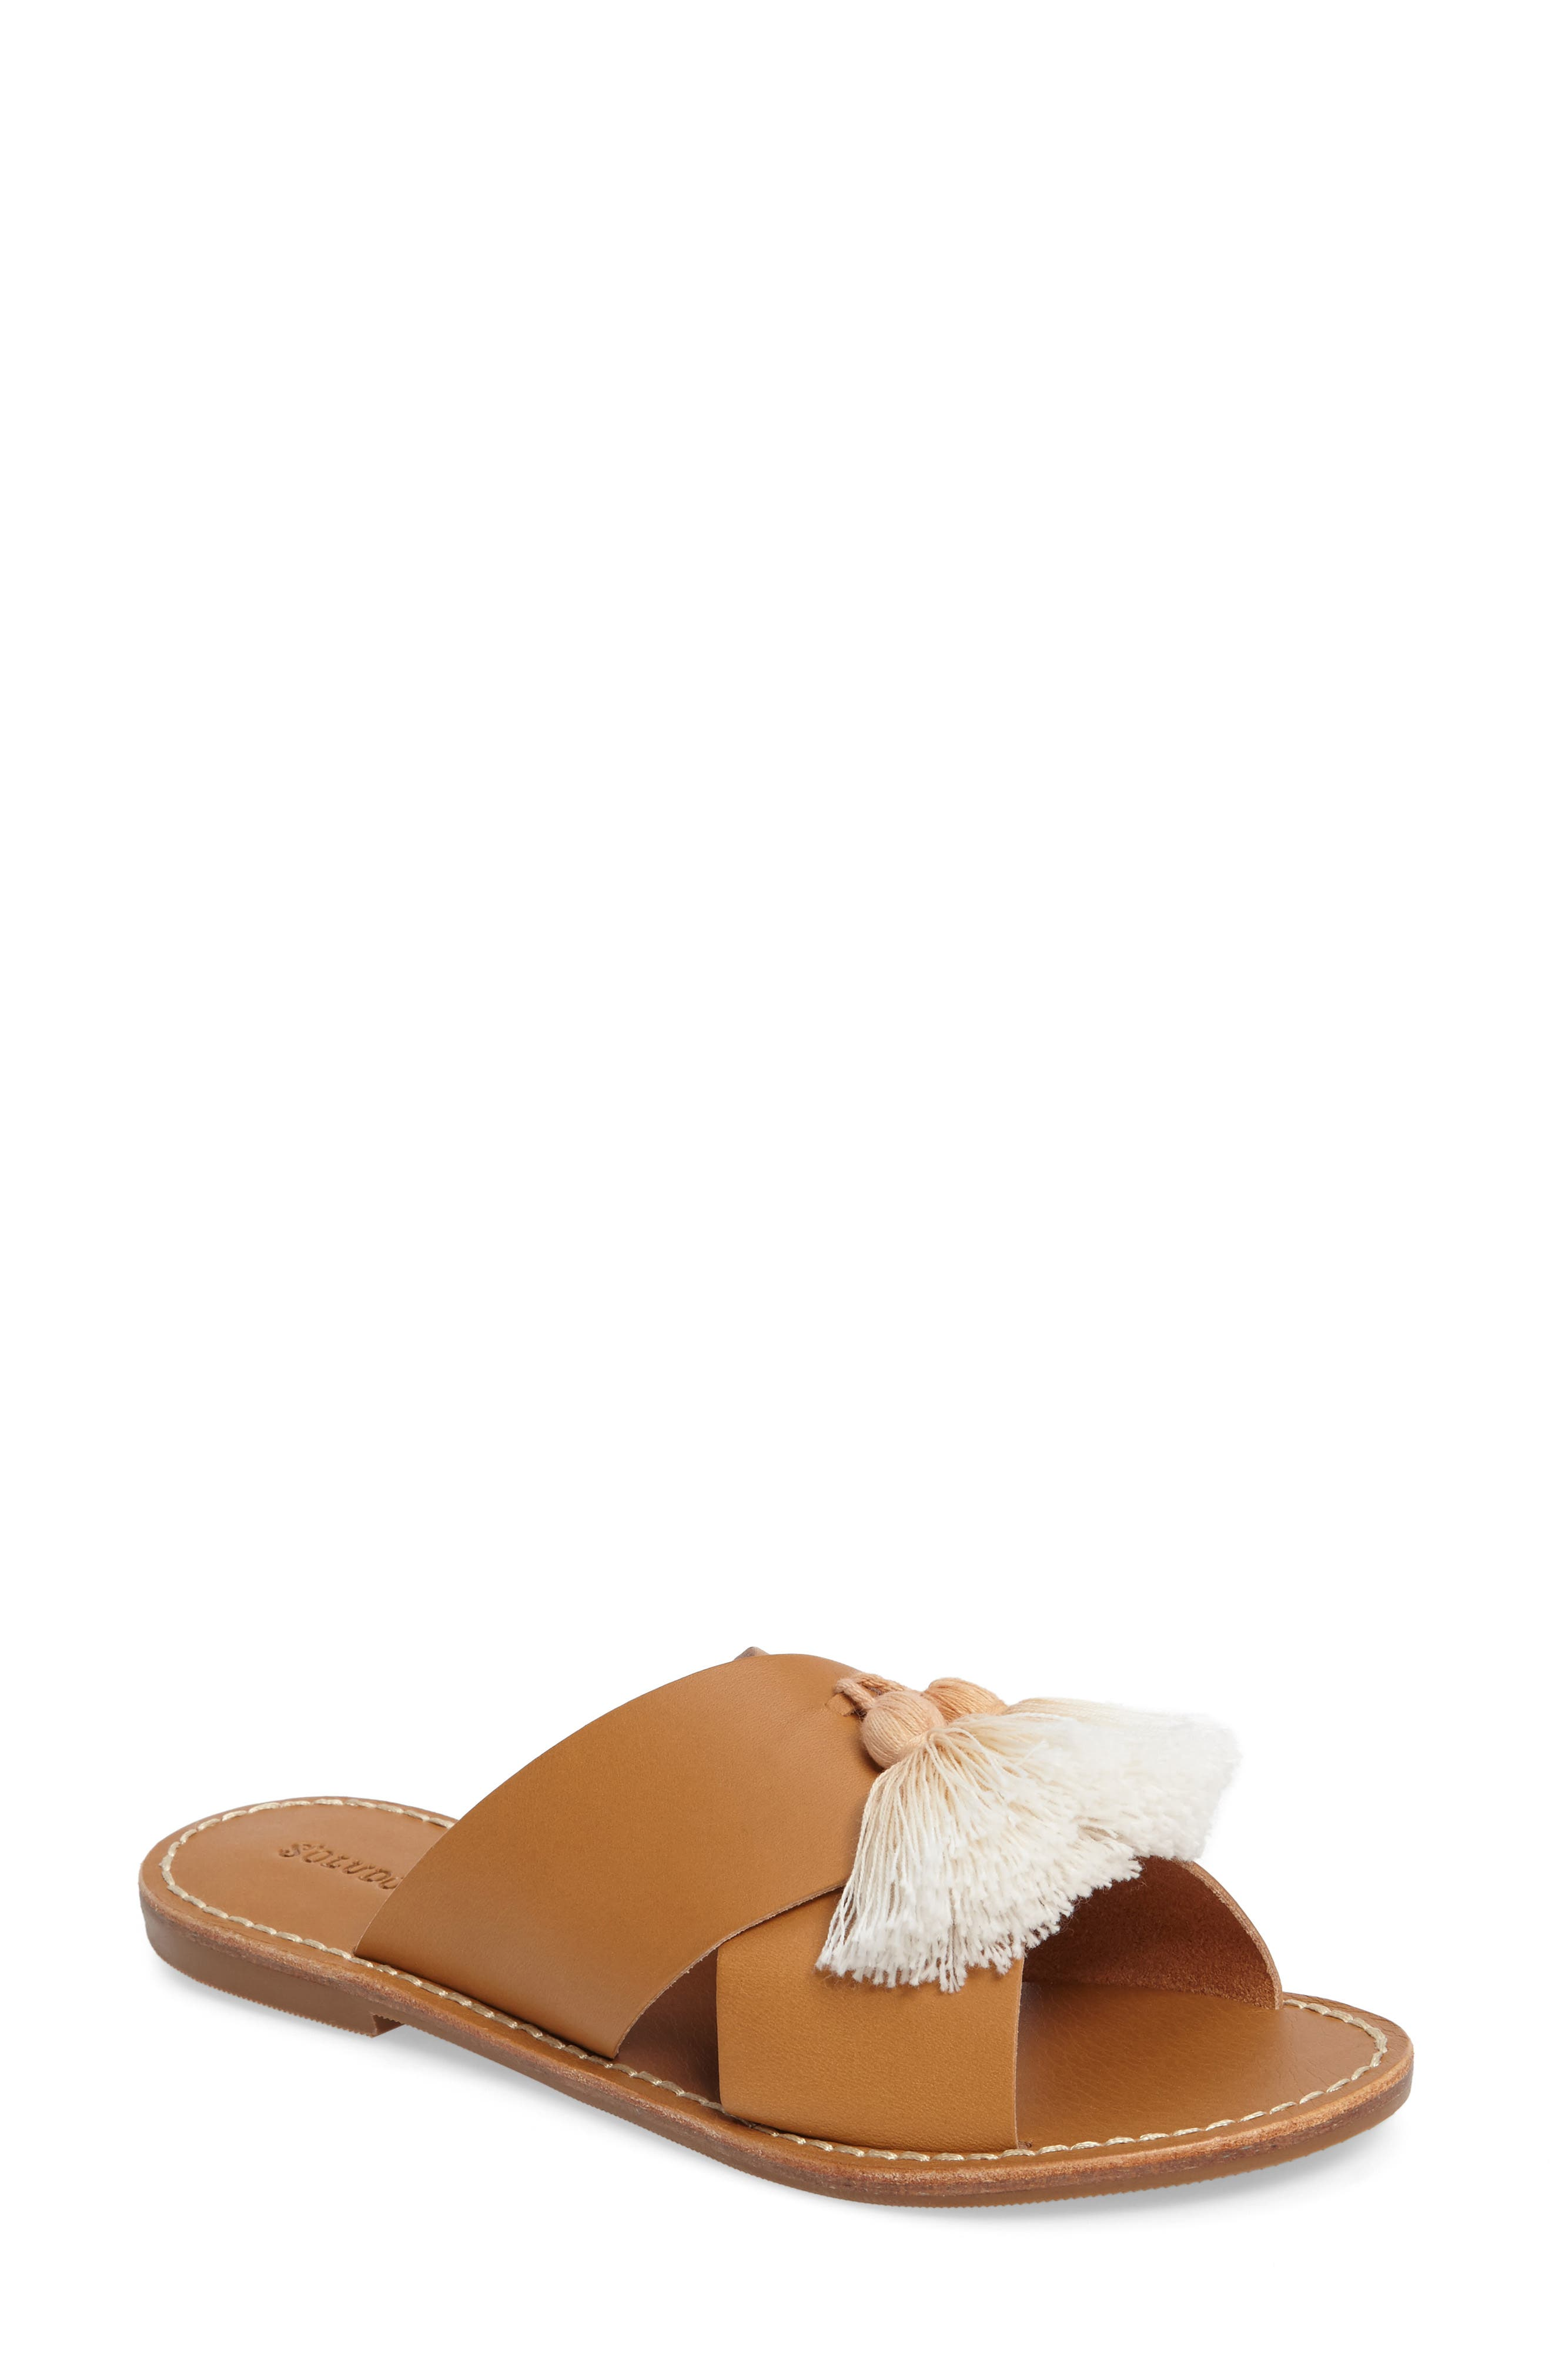 Tassel Slide Sandal,                             Main thumbnail 1, color,                             Brown Leather